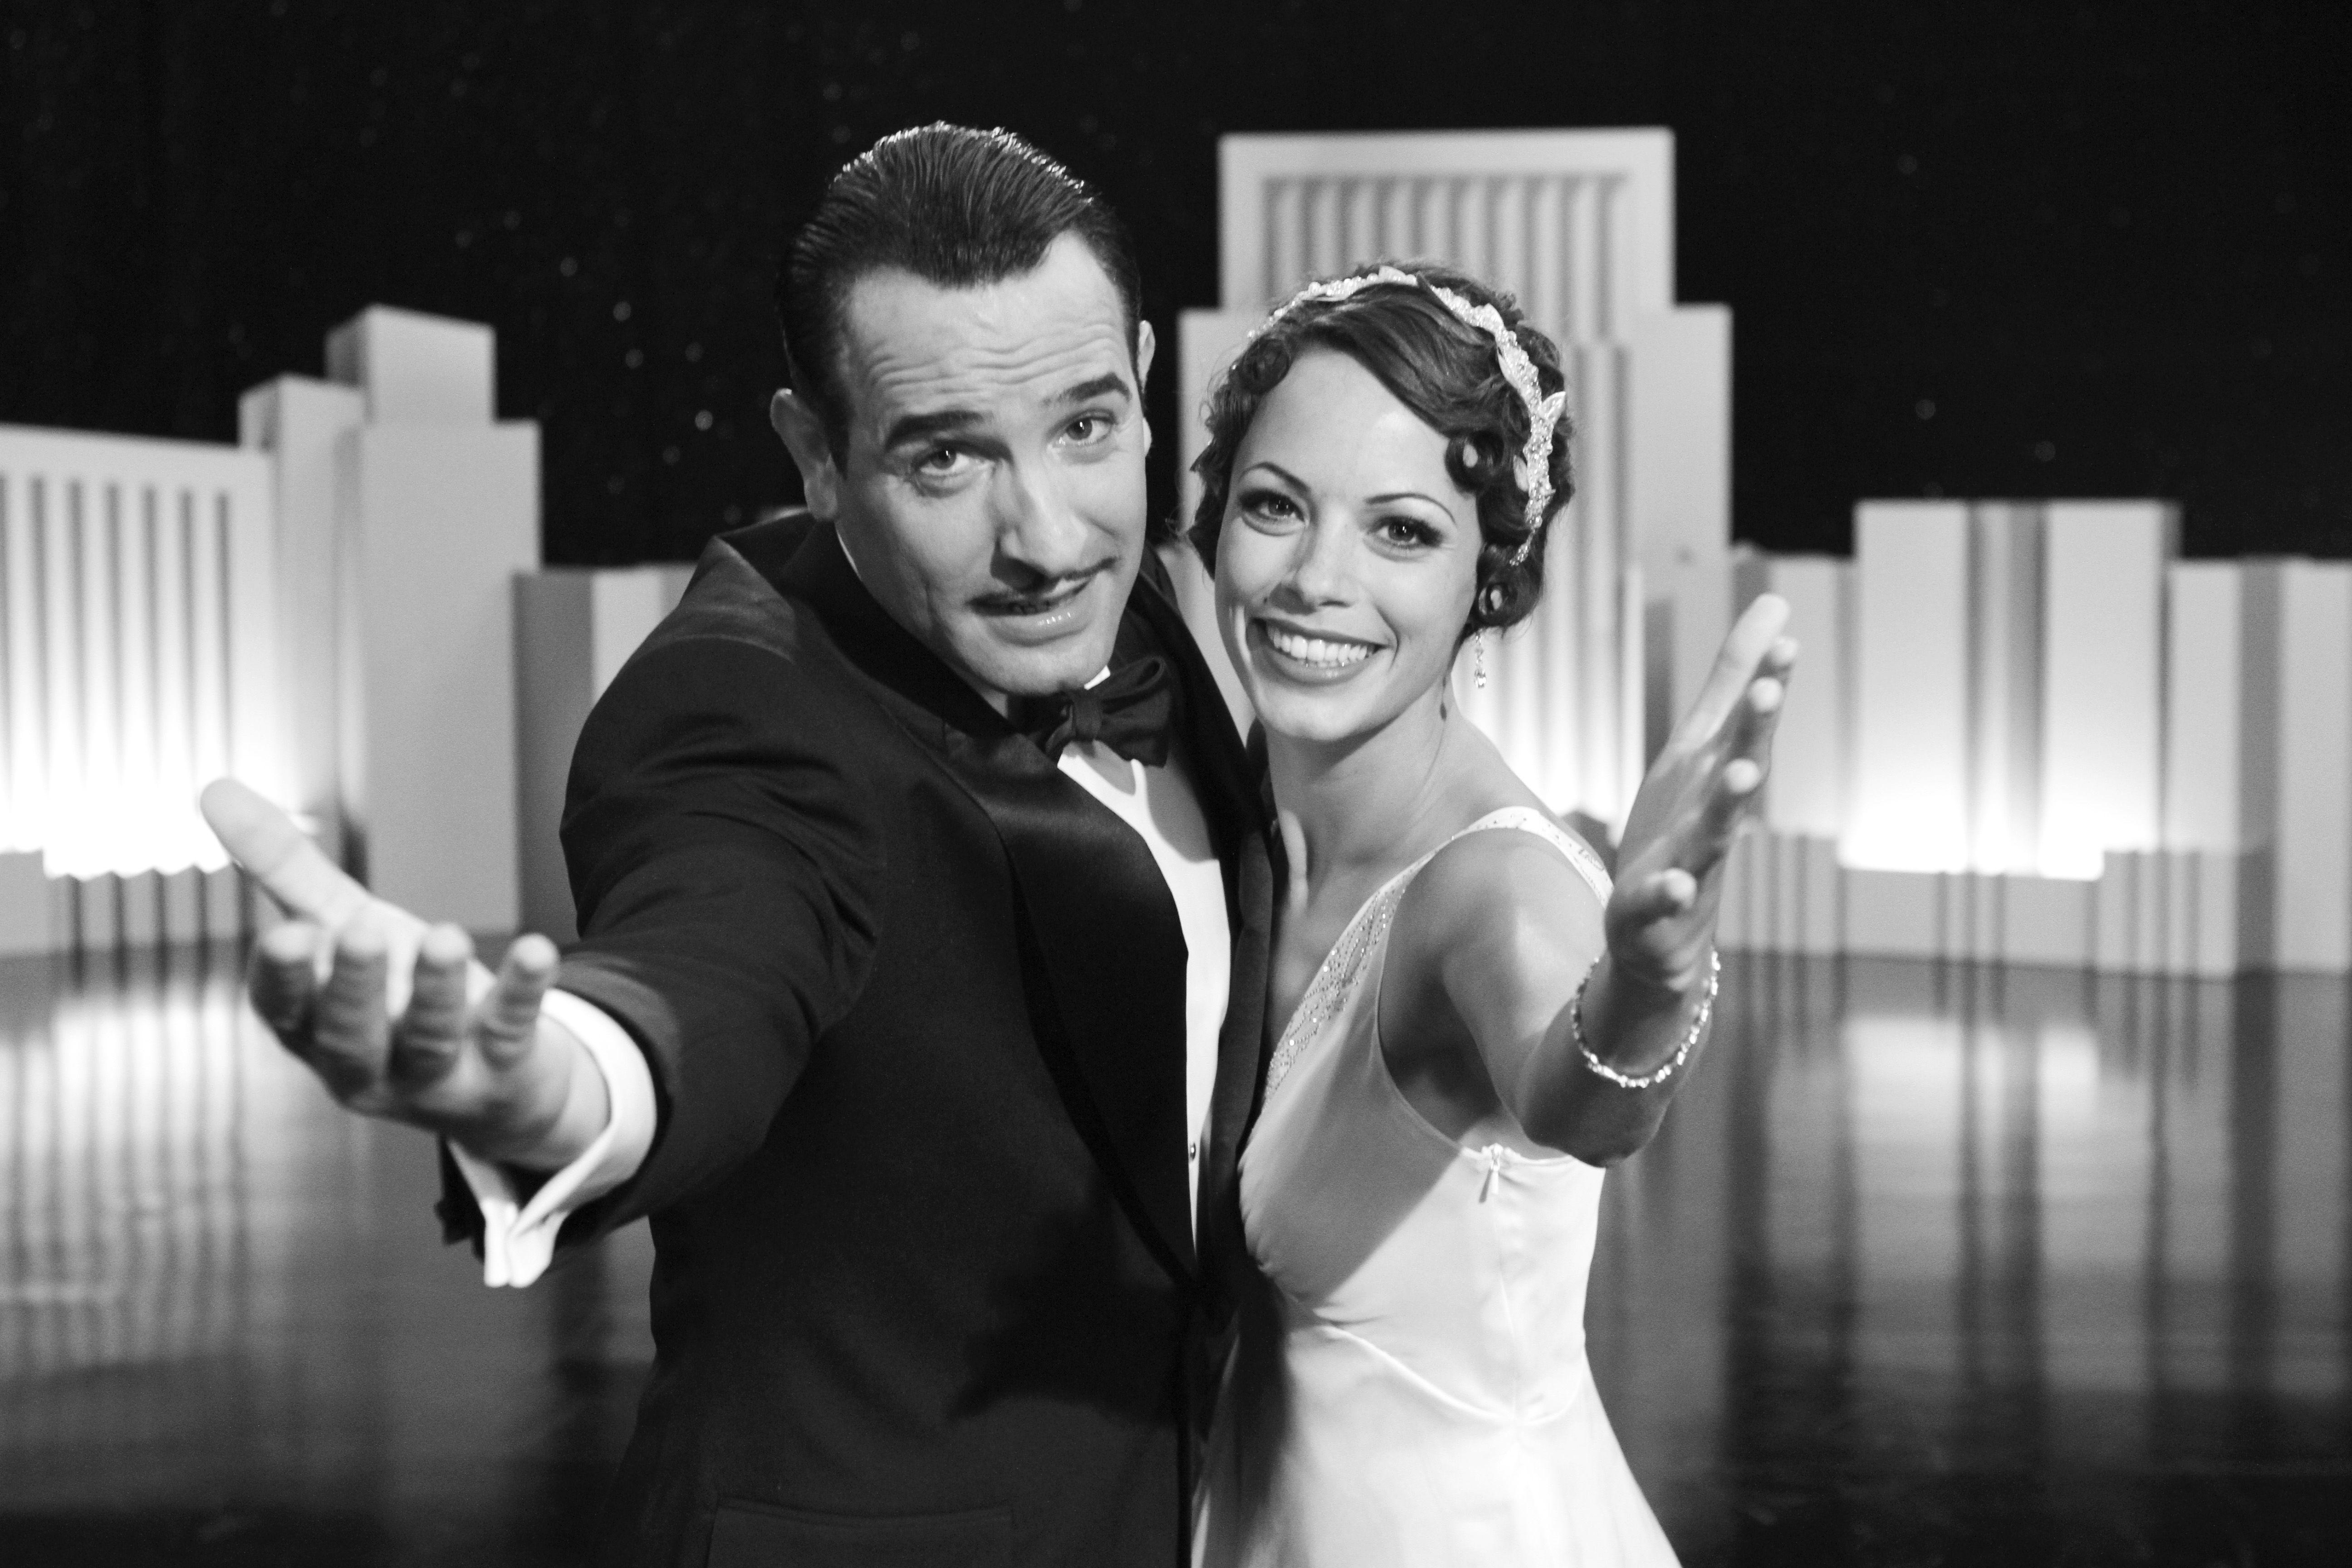 The Artist - Jean Dujardin & Bérénice Bejo